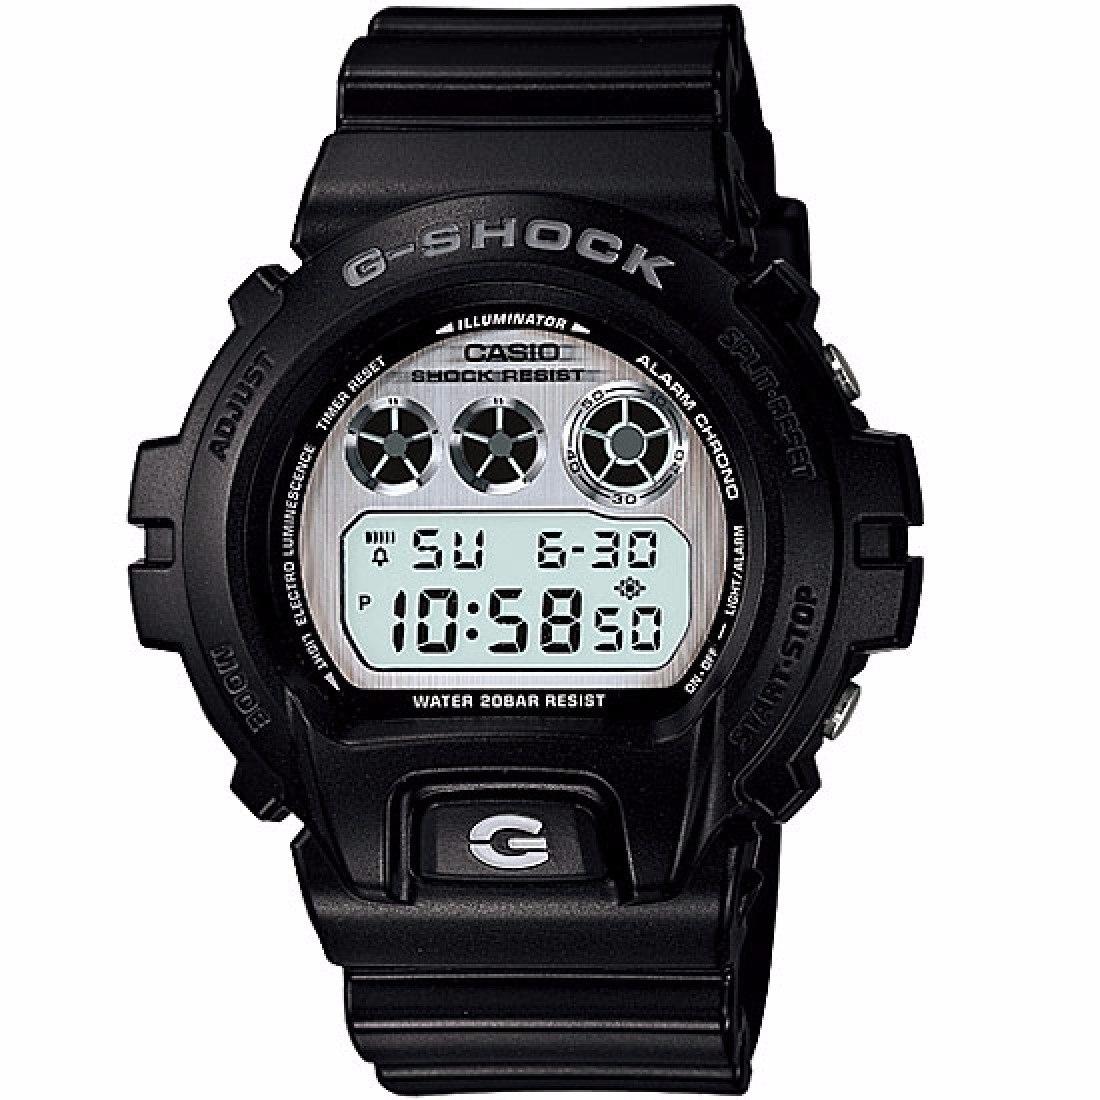 8fcc0a5a806 relogio casio g-shock dw-6900 hm wr-200mt alarme cronometro. Carregando  zoom.